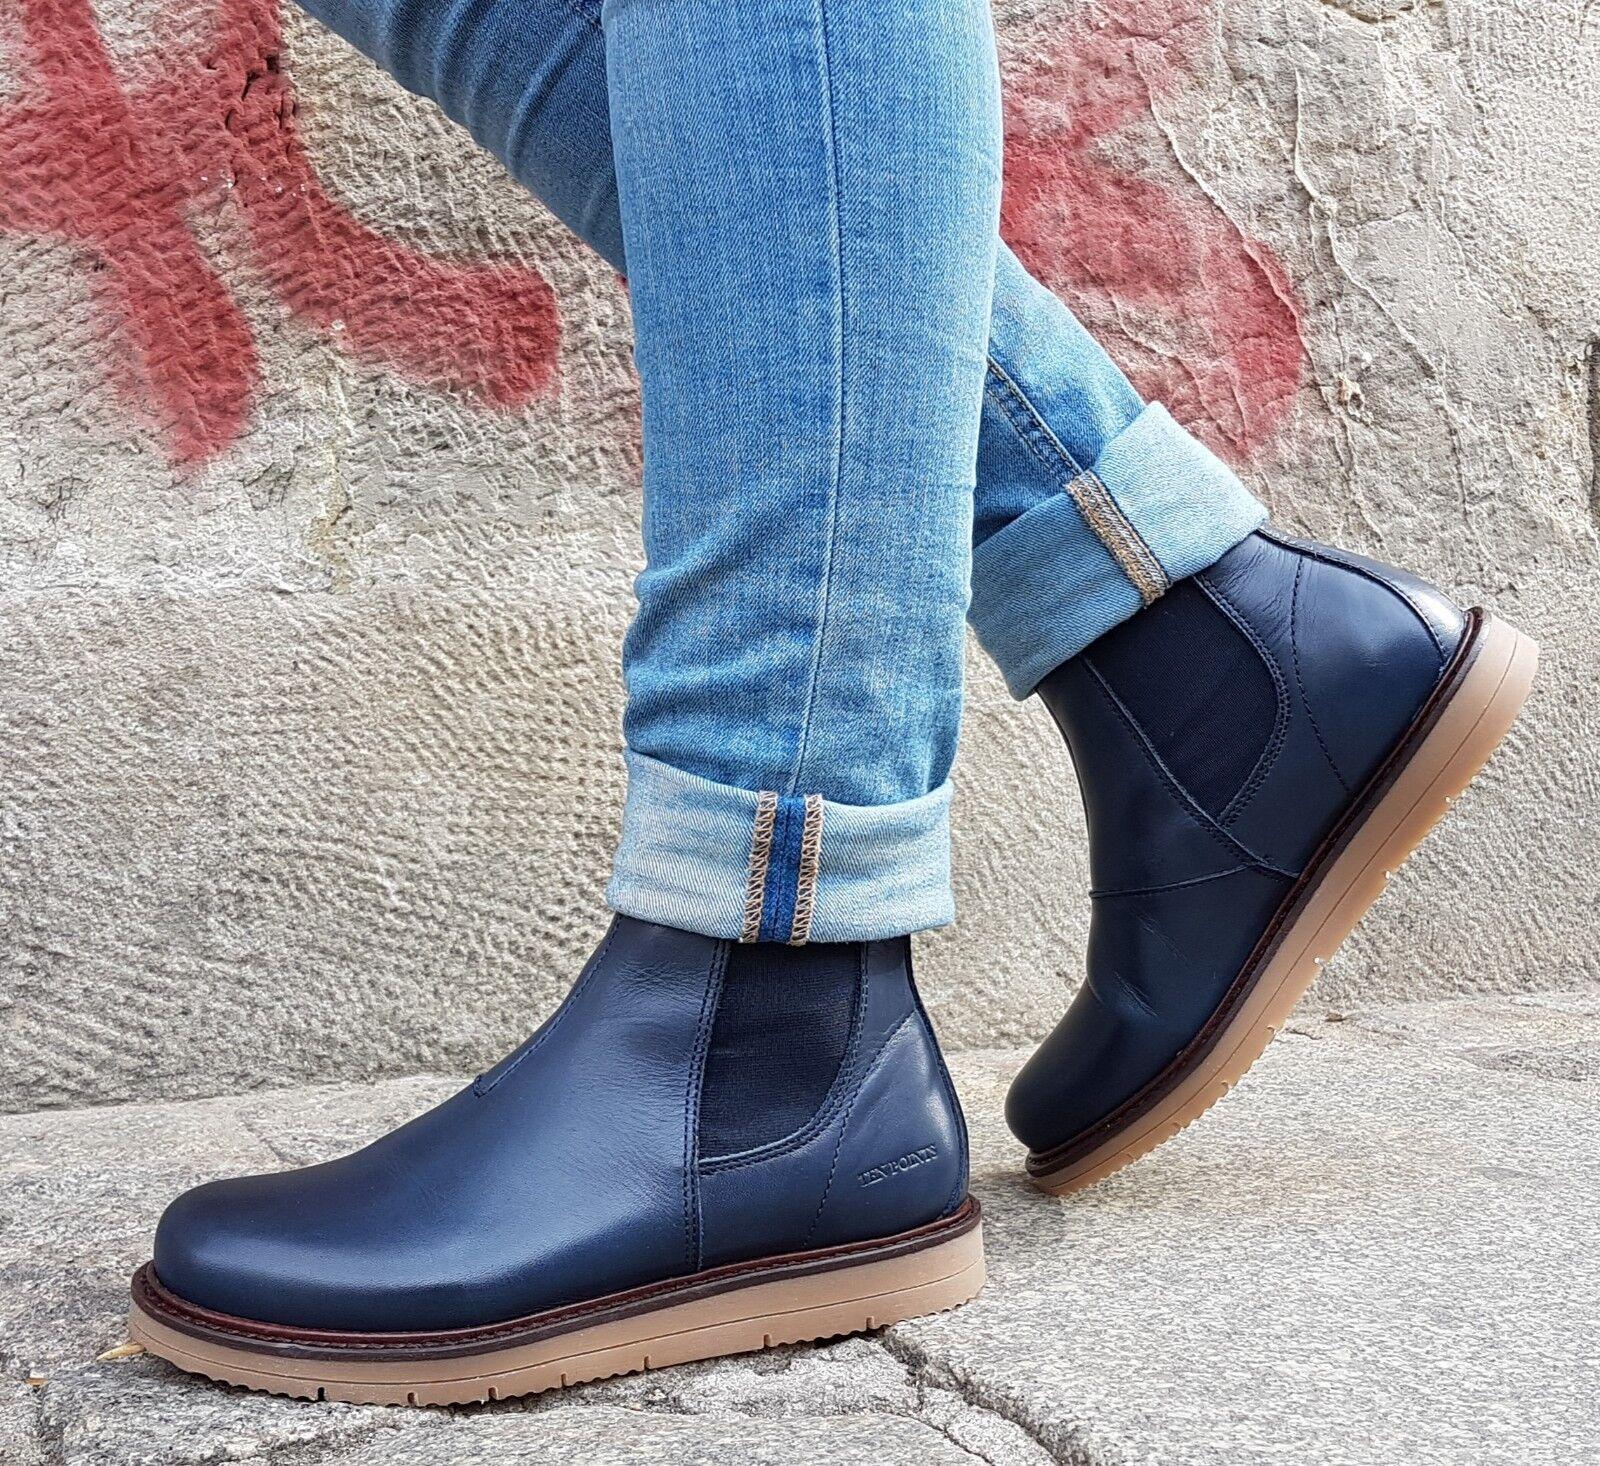 Ten Points Chaussures en Cuir Carina 386005 darkbleu 703 Chelsea-démarrage warmfutter